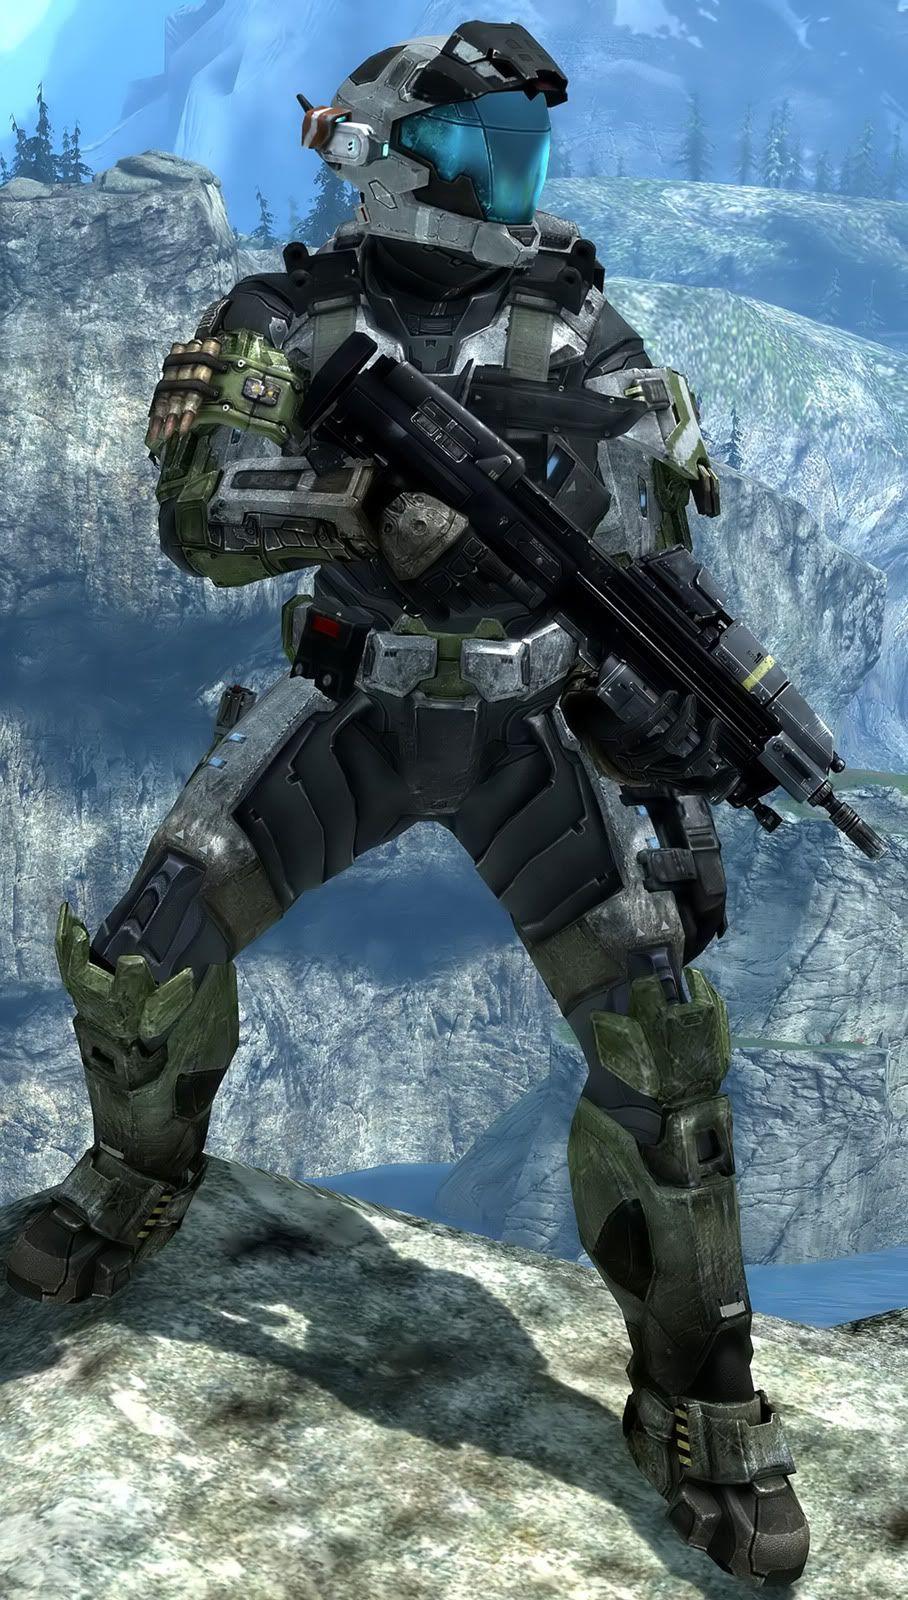 Pin By Nikeninja On Armor Cyborgs Droids Halo Armor Future Soldiers Combat Armor